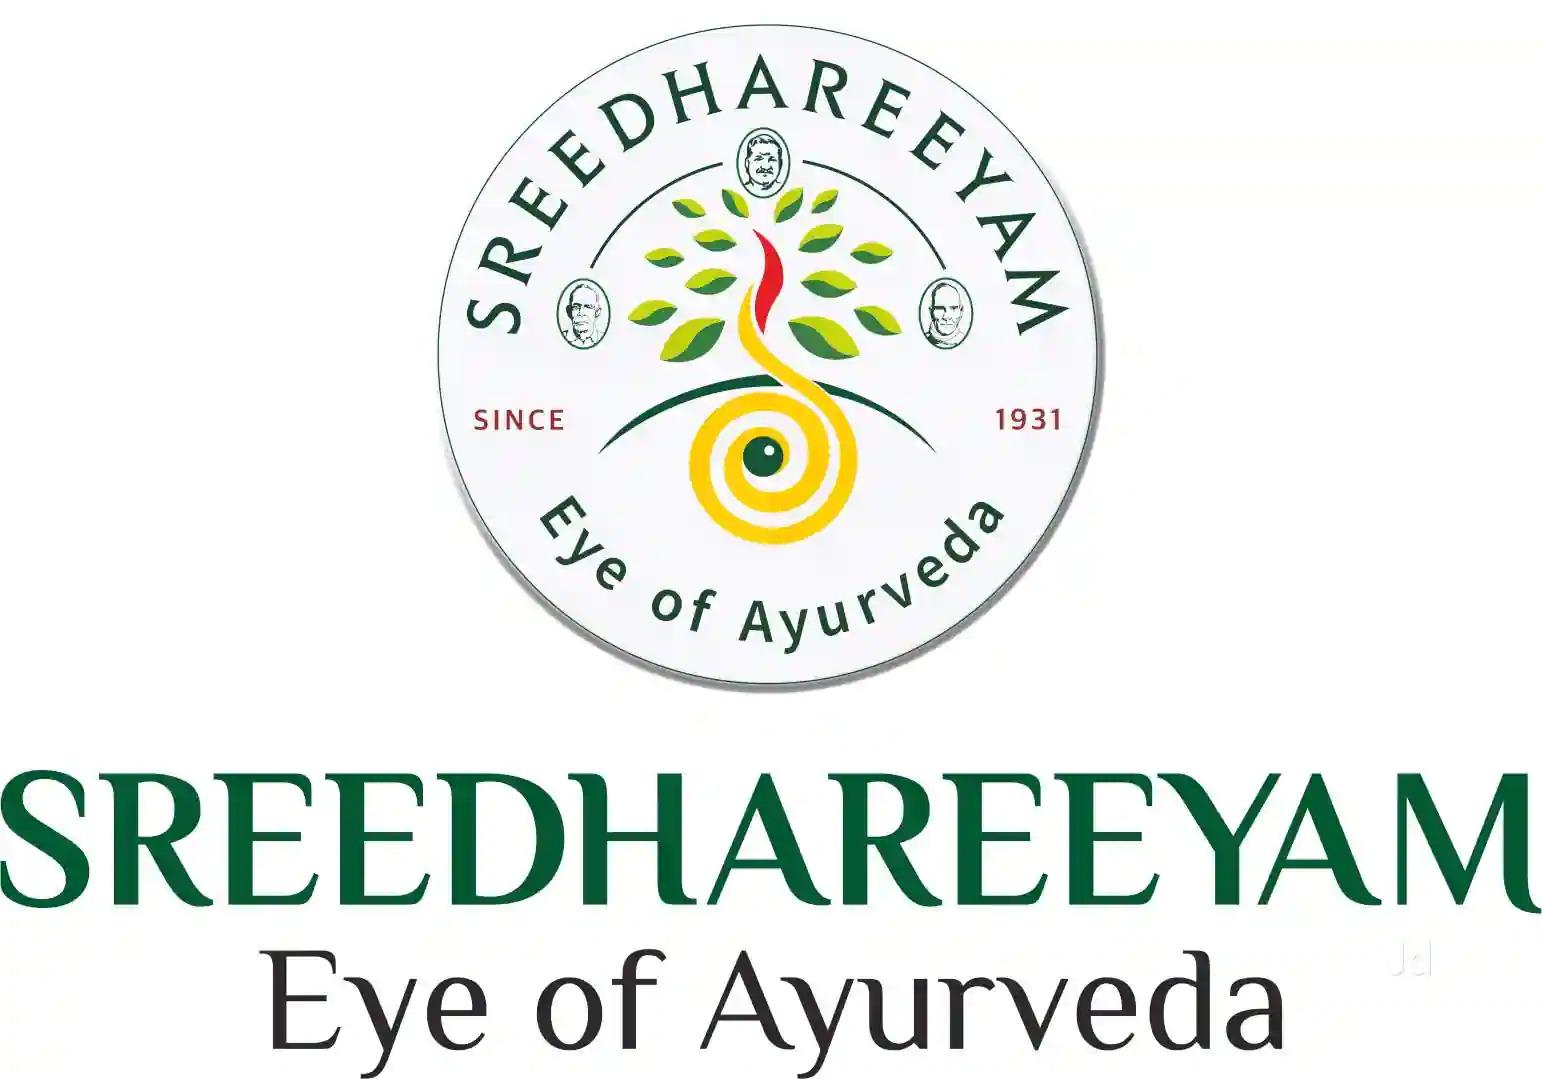 sreedhareeyam-ayurvedic-eye-clinic-and-panchakarma-centre-talap-kannur-ayurvedic-eye-treatment-centres-x6sdohteqa